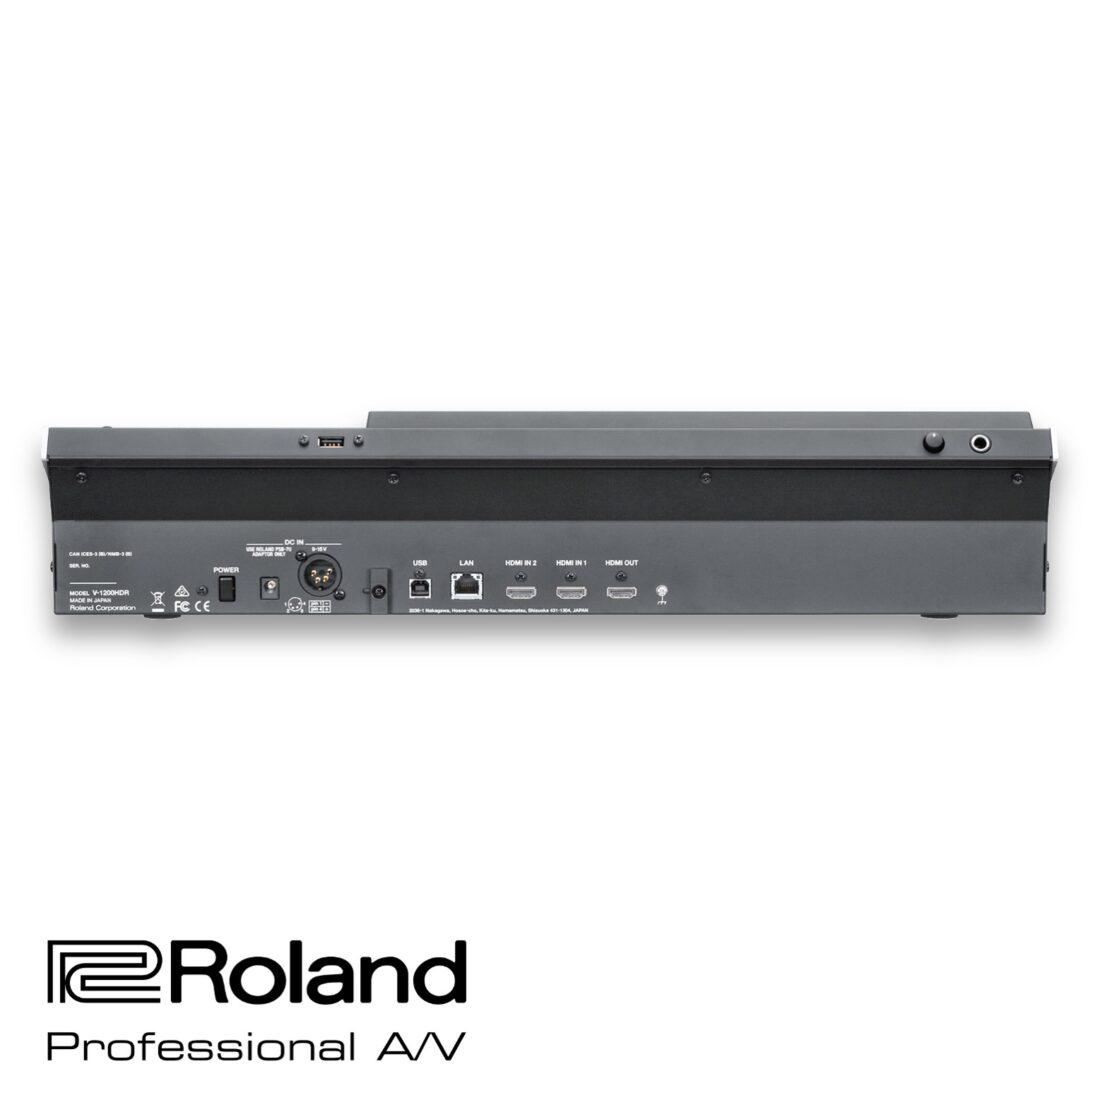 Roland V-1200HD panel